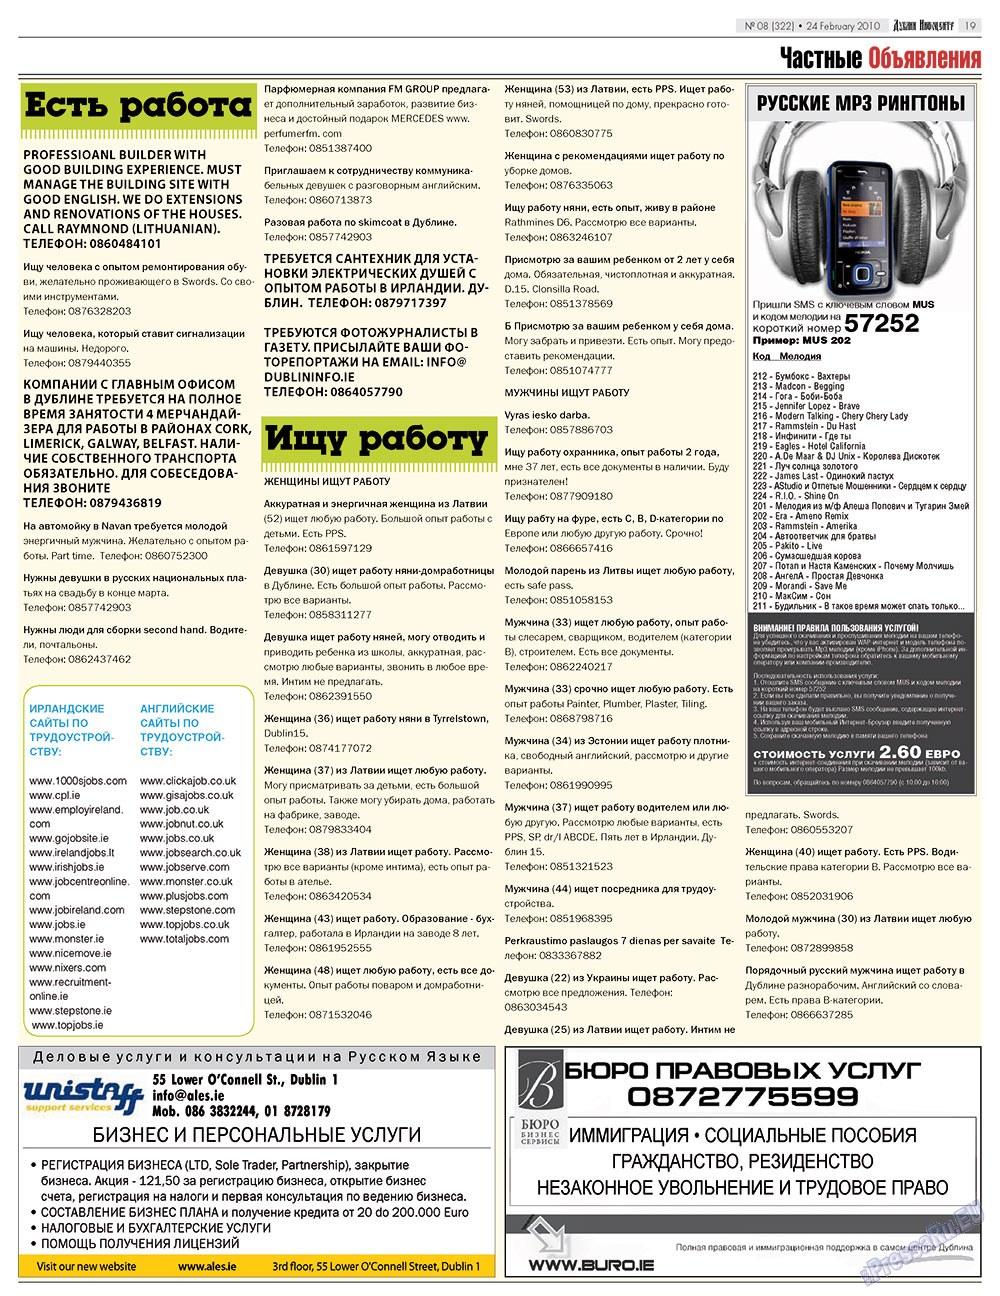 Дублин инфоцентр (газета). 2010 год, номер 8, стр. 19